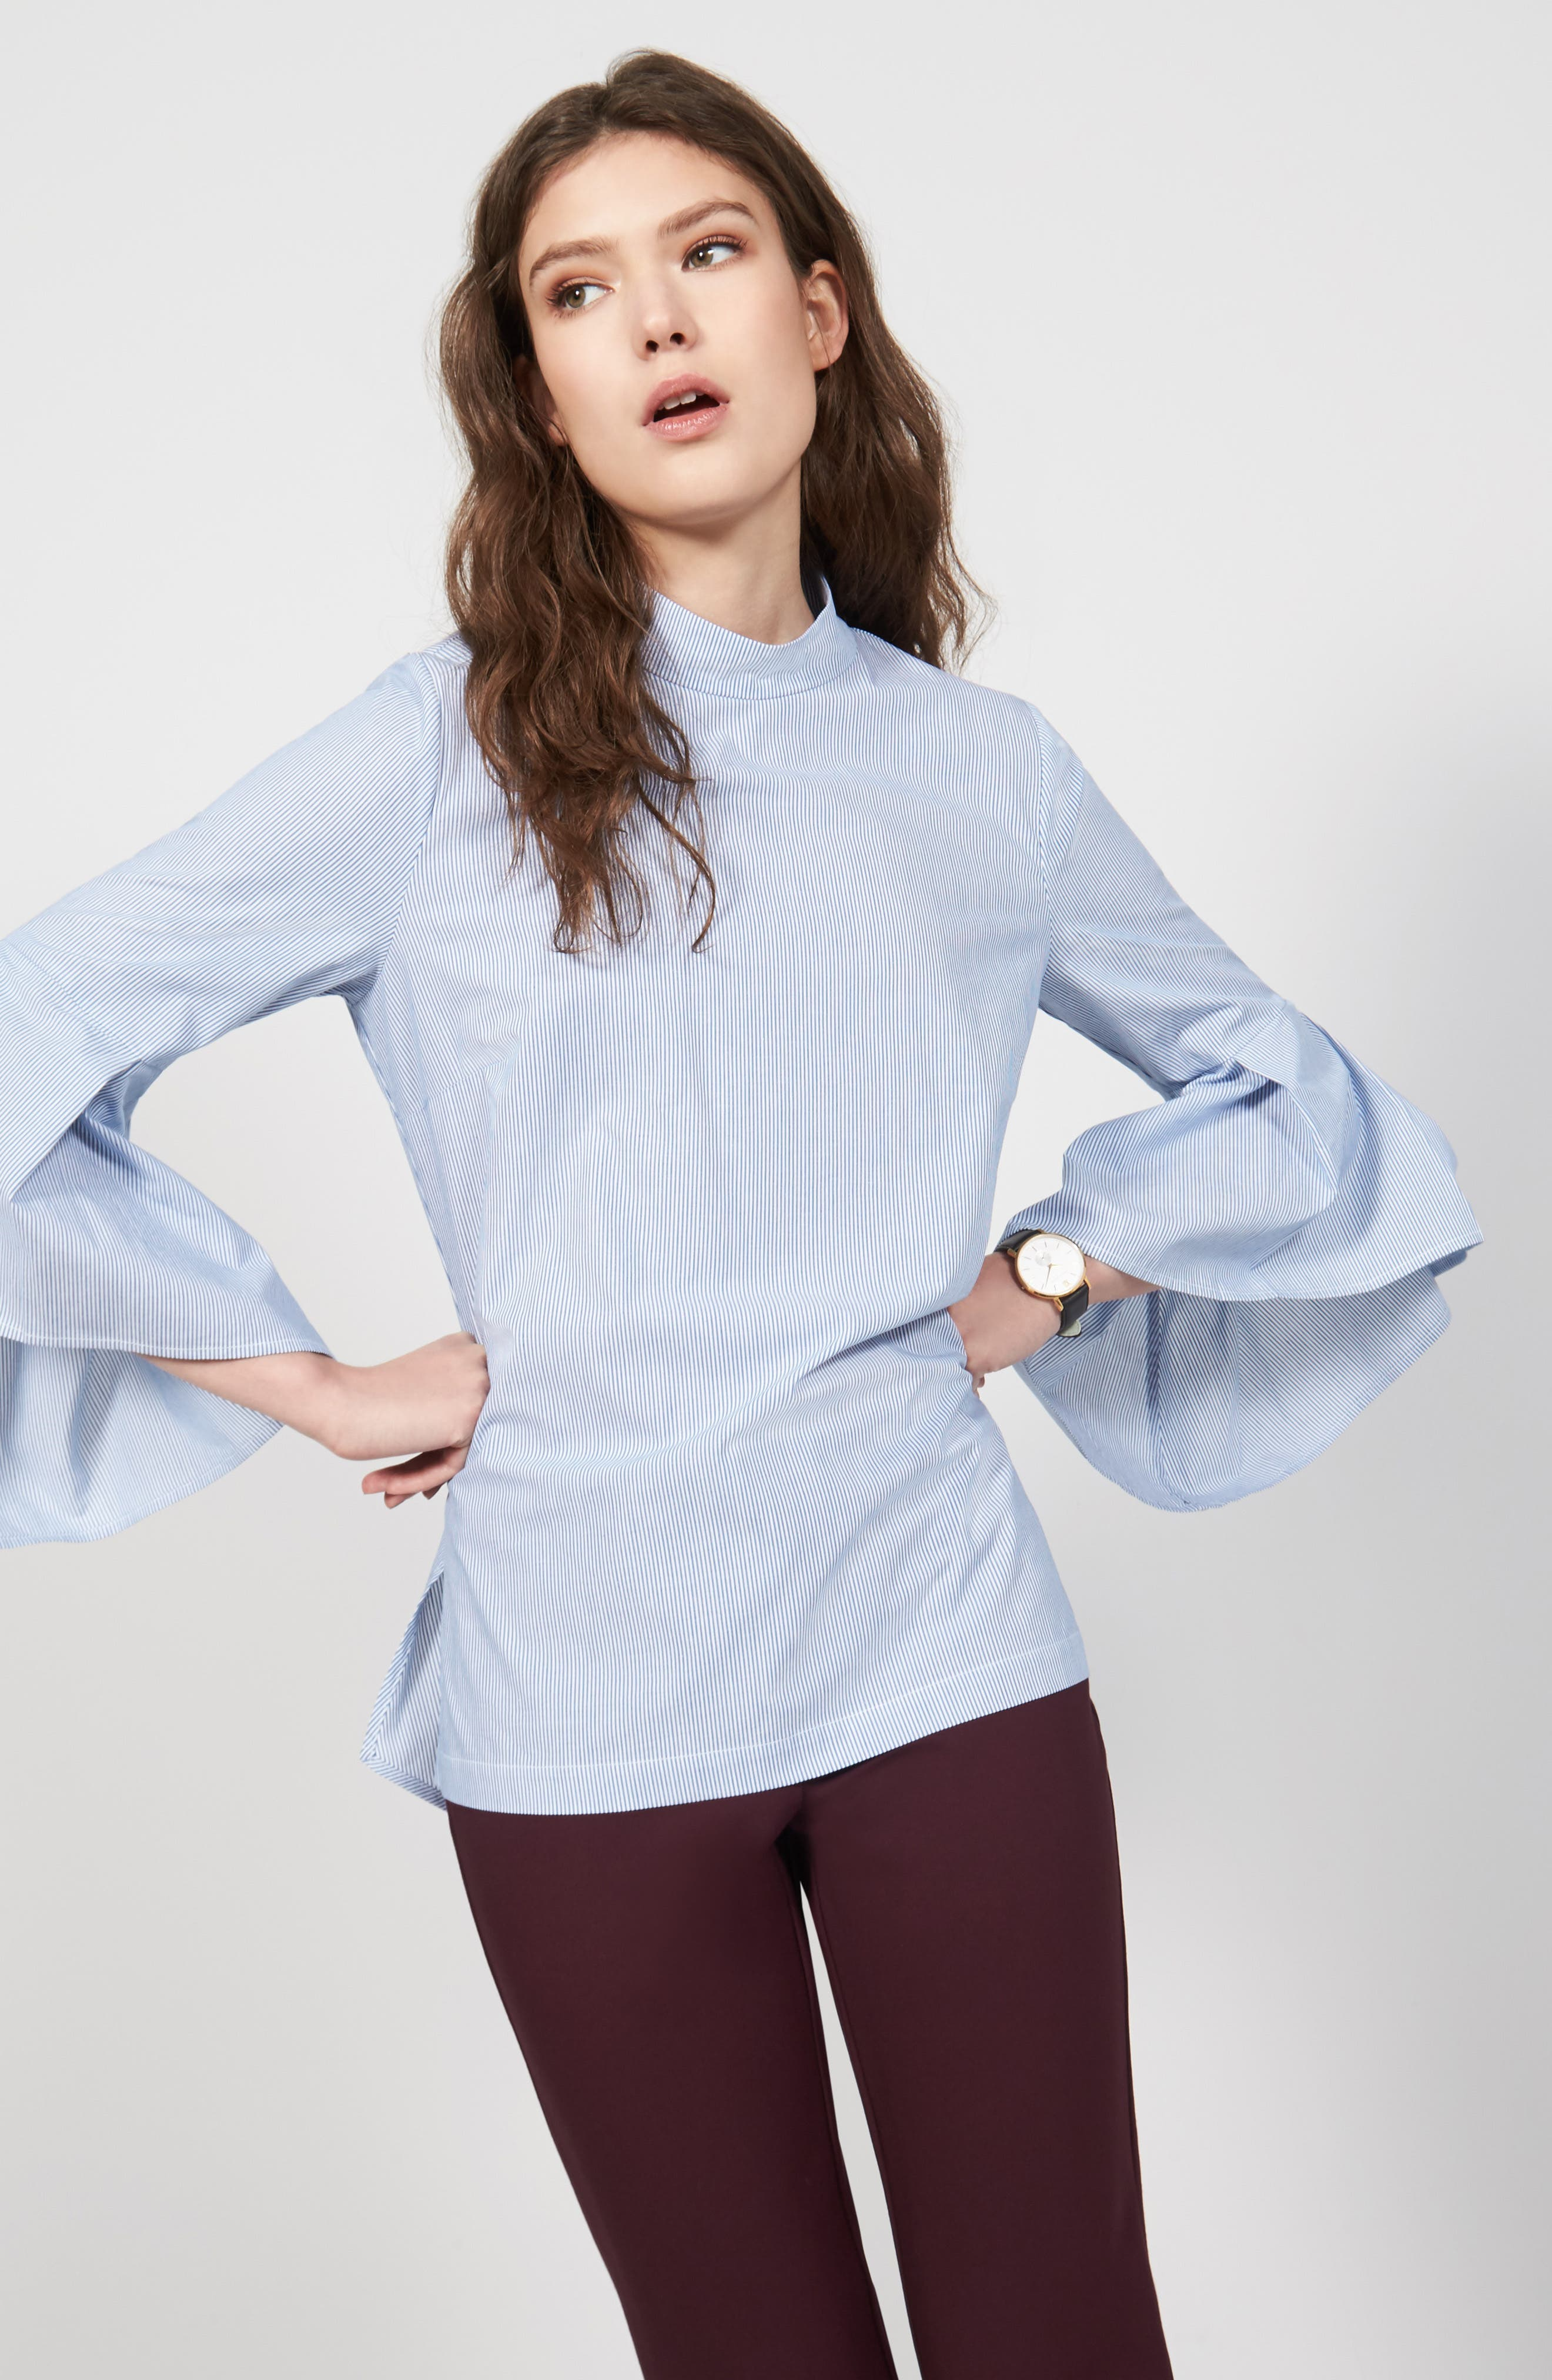 Ruffle Sleeve Poplin Shirt,                             Alternate thumbnail 2, color,                             Blue/ White Stripe